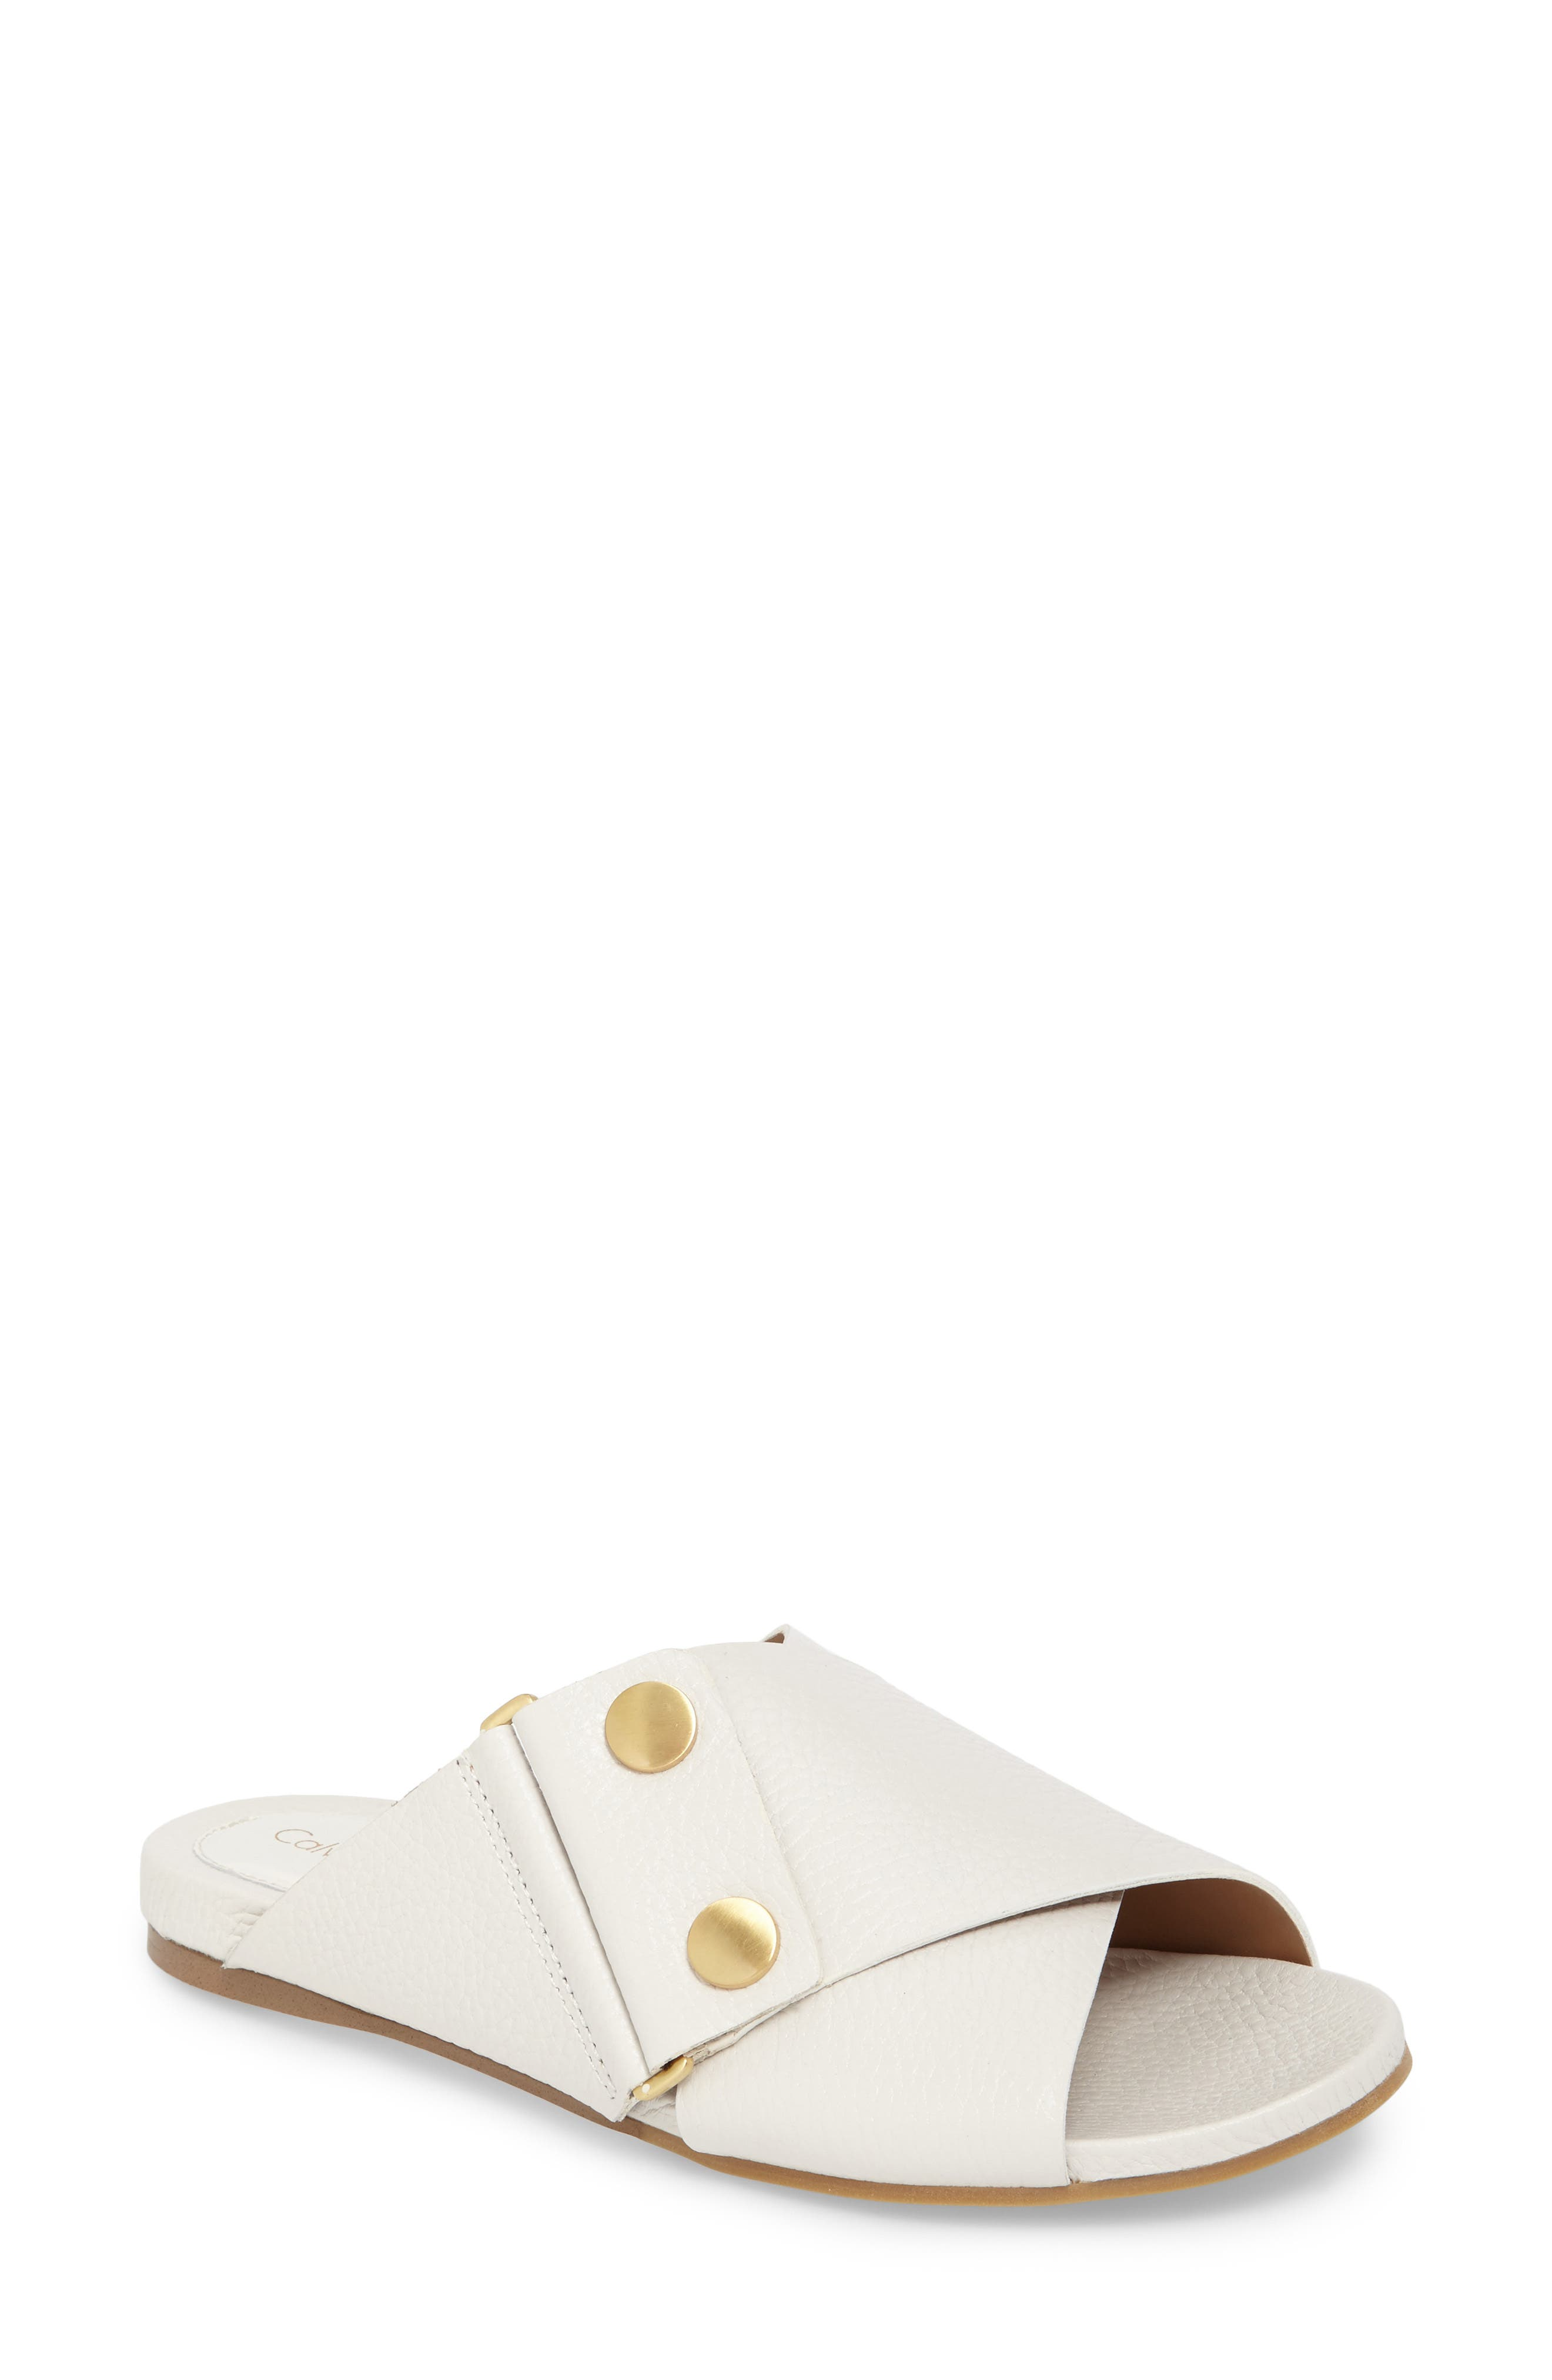 CALVIN KLEIN Pamice Cross Strap Sandal